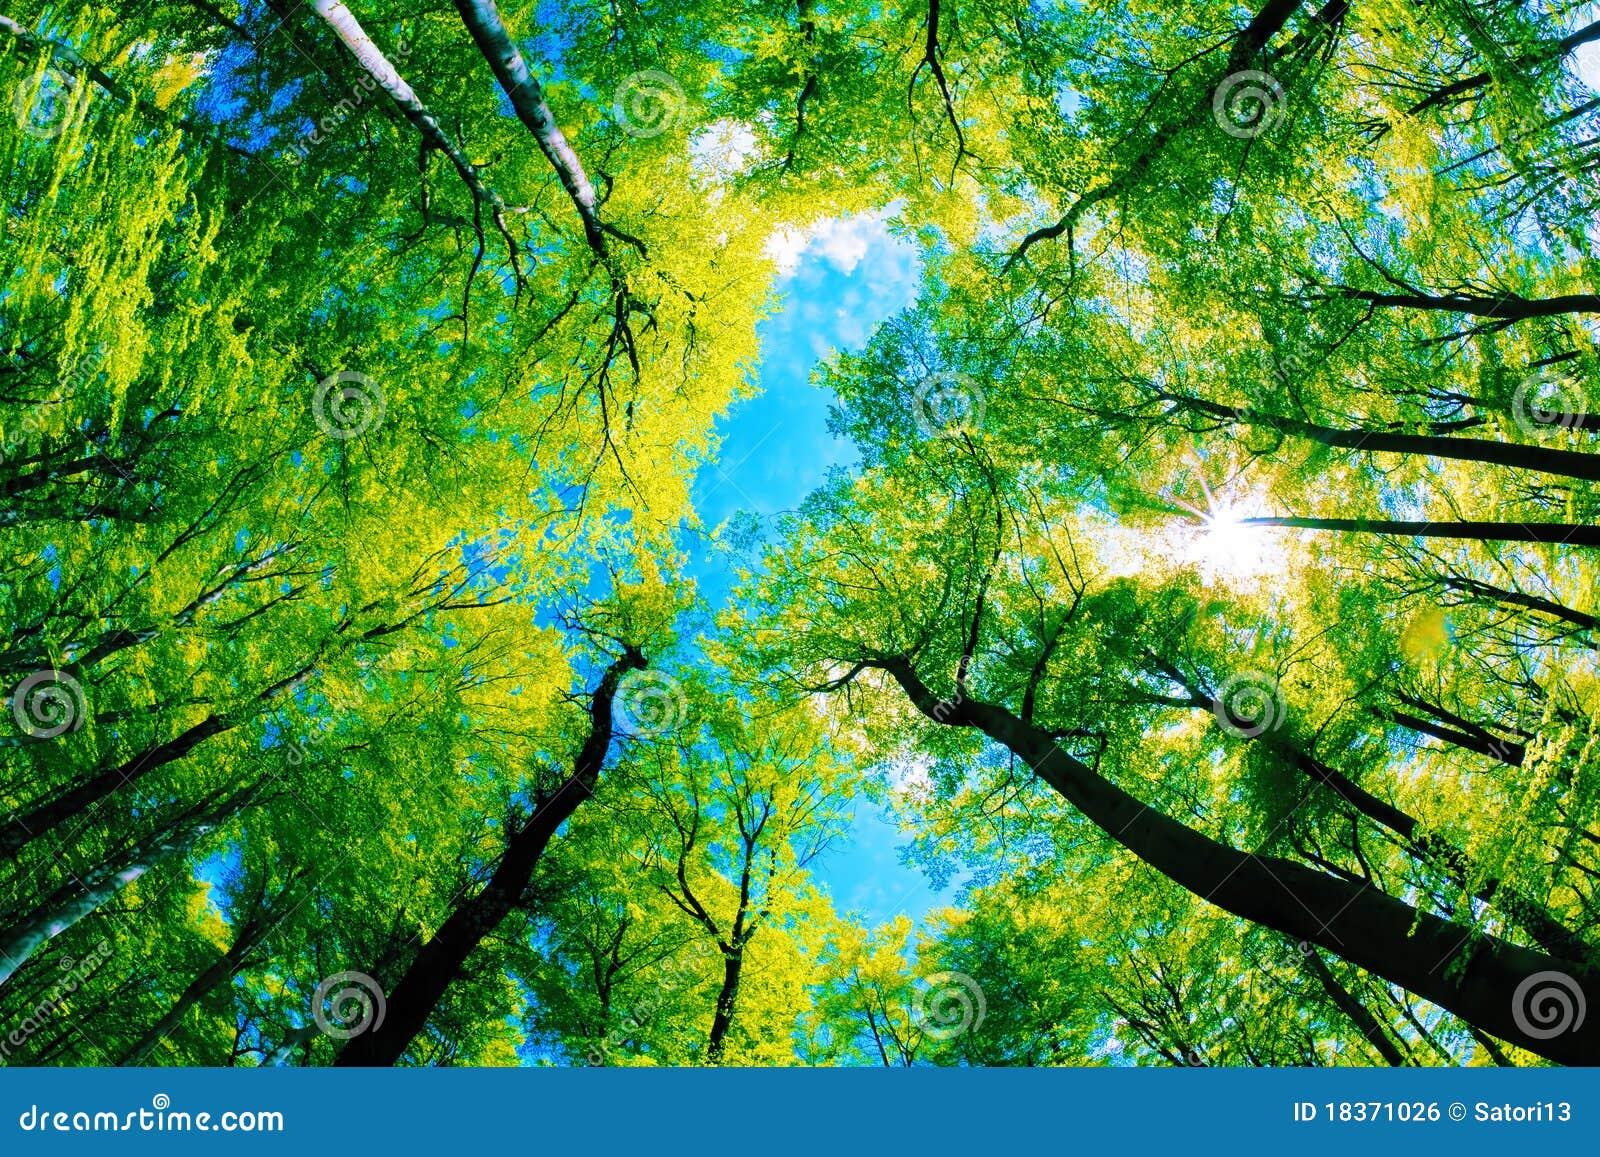 Tree Canopy Royalty Free Stock Image Image 18371026